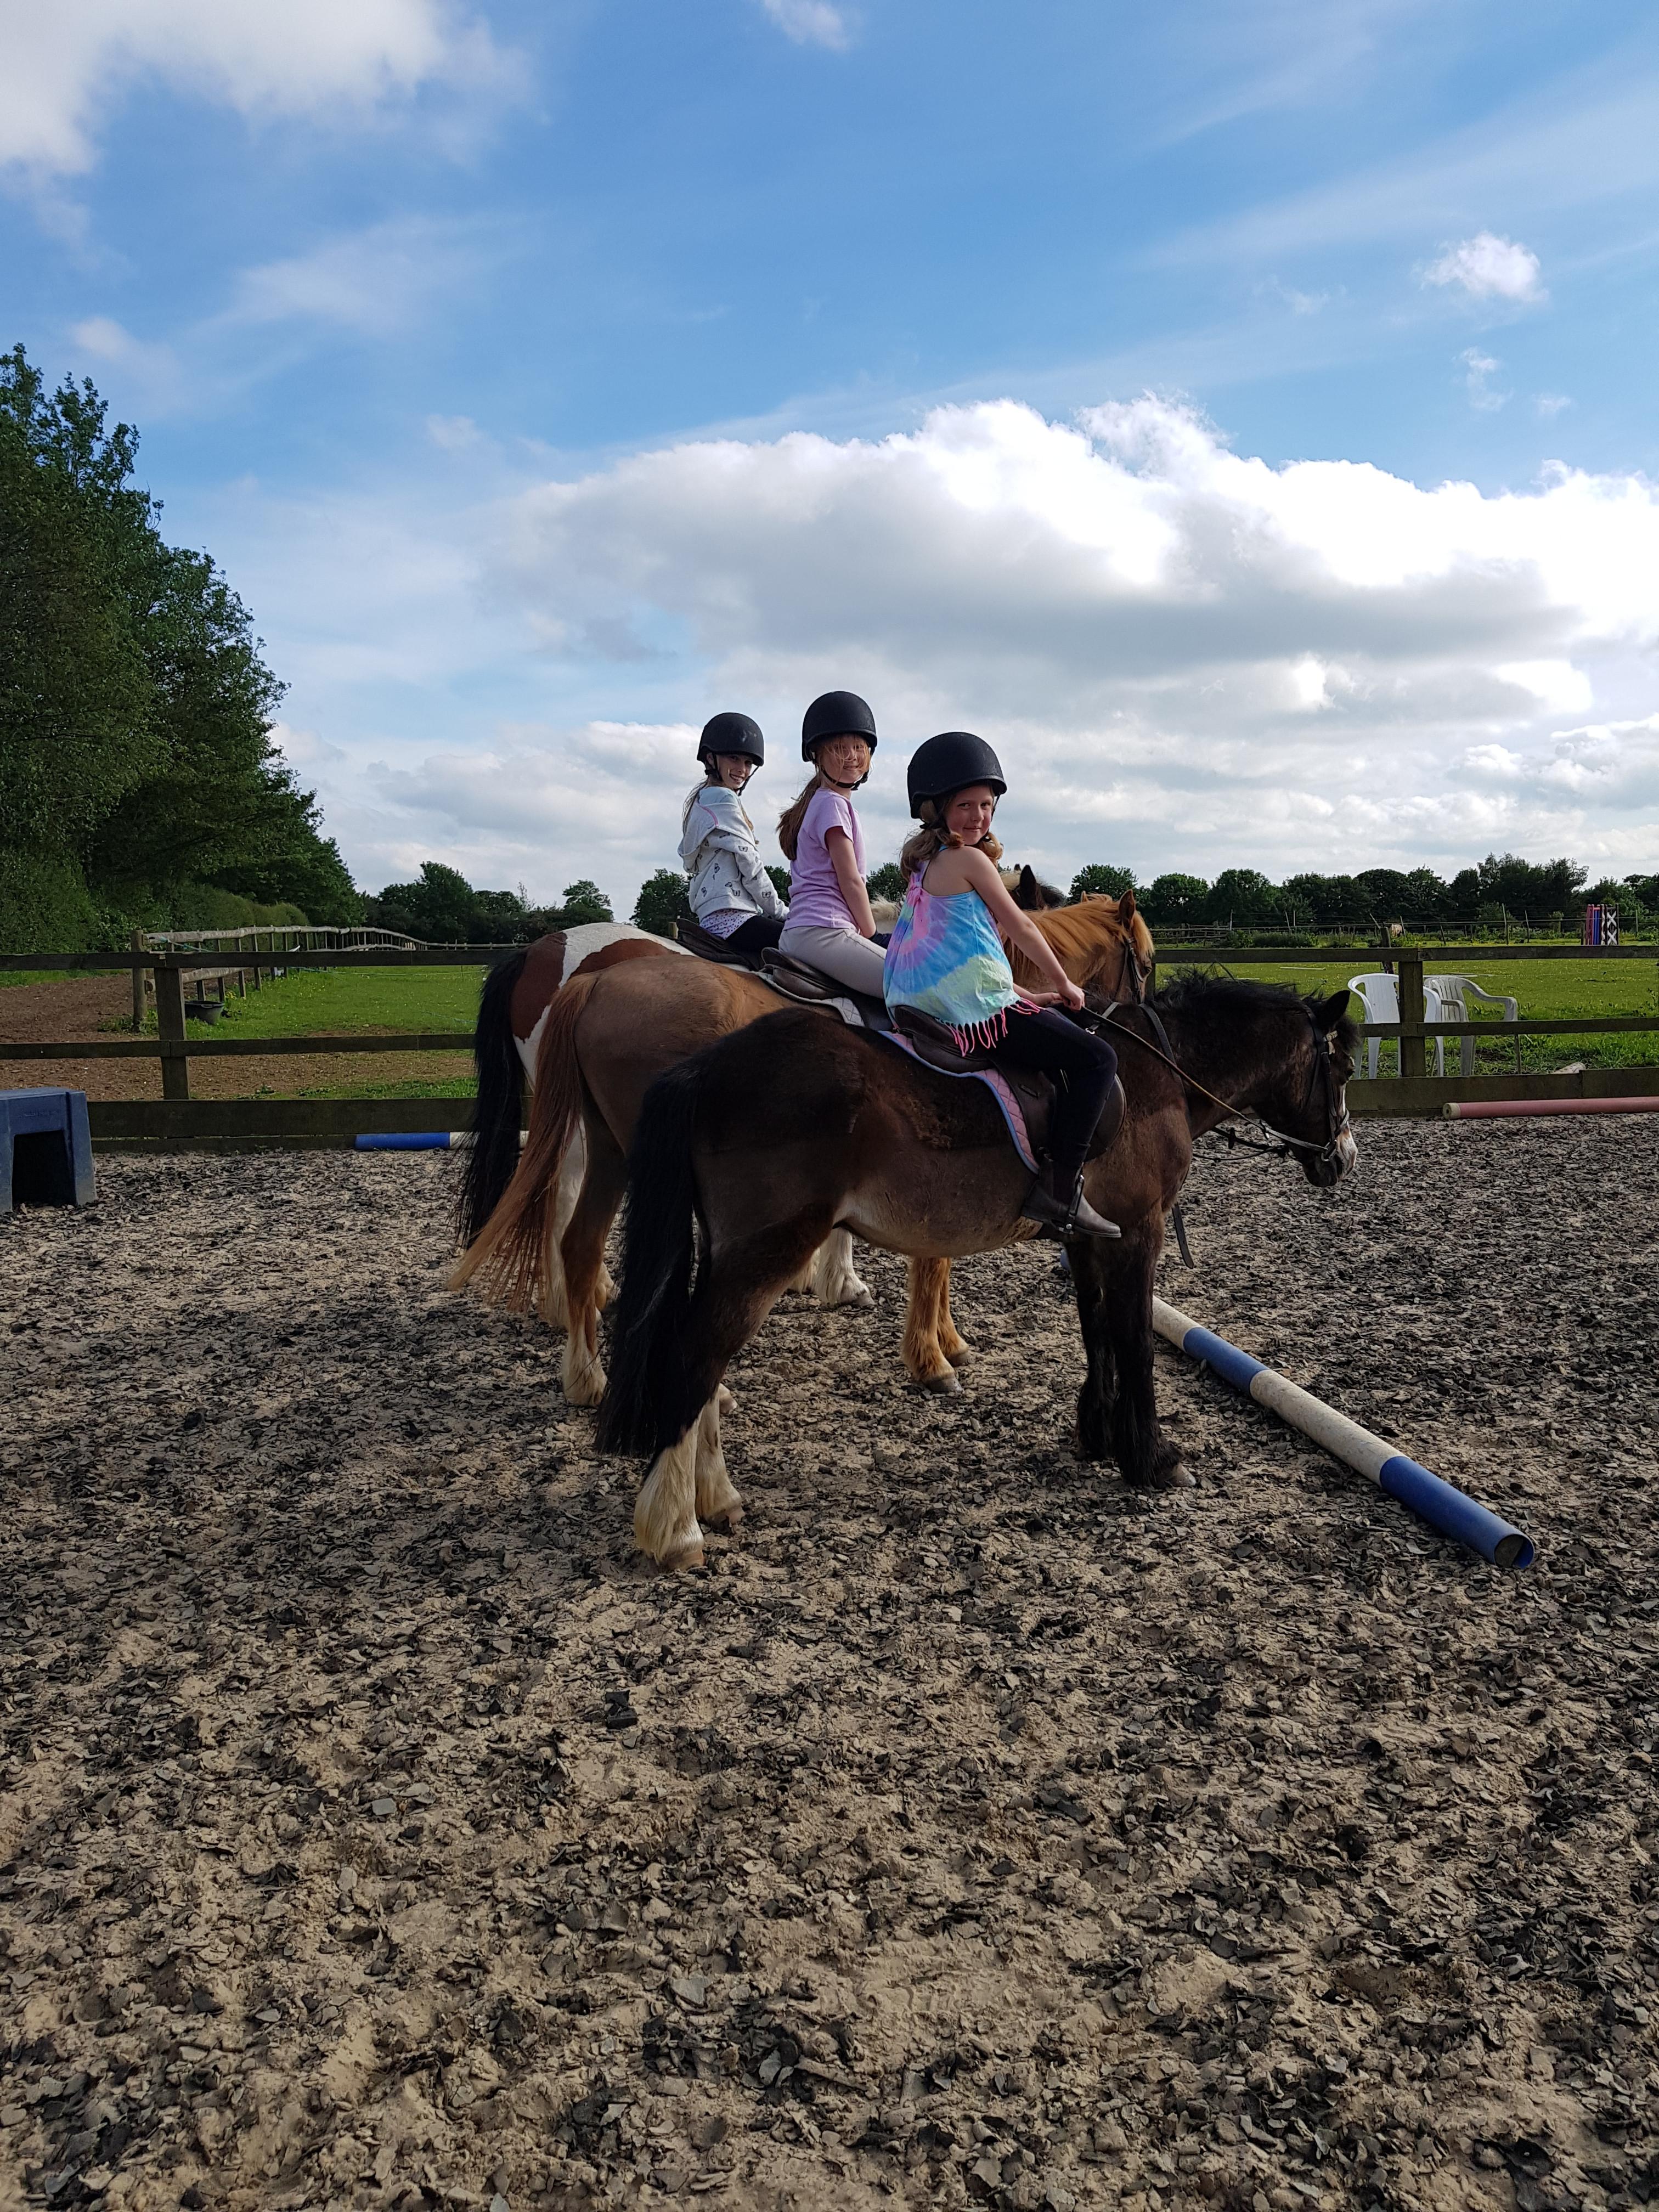 Saturday Pony Club - Sibling discount